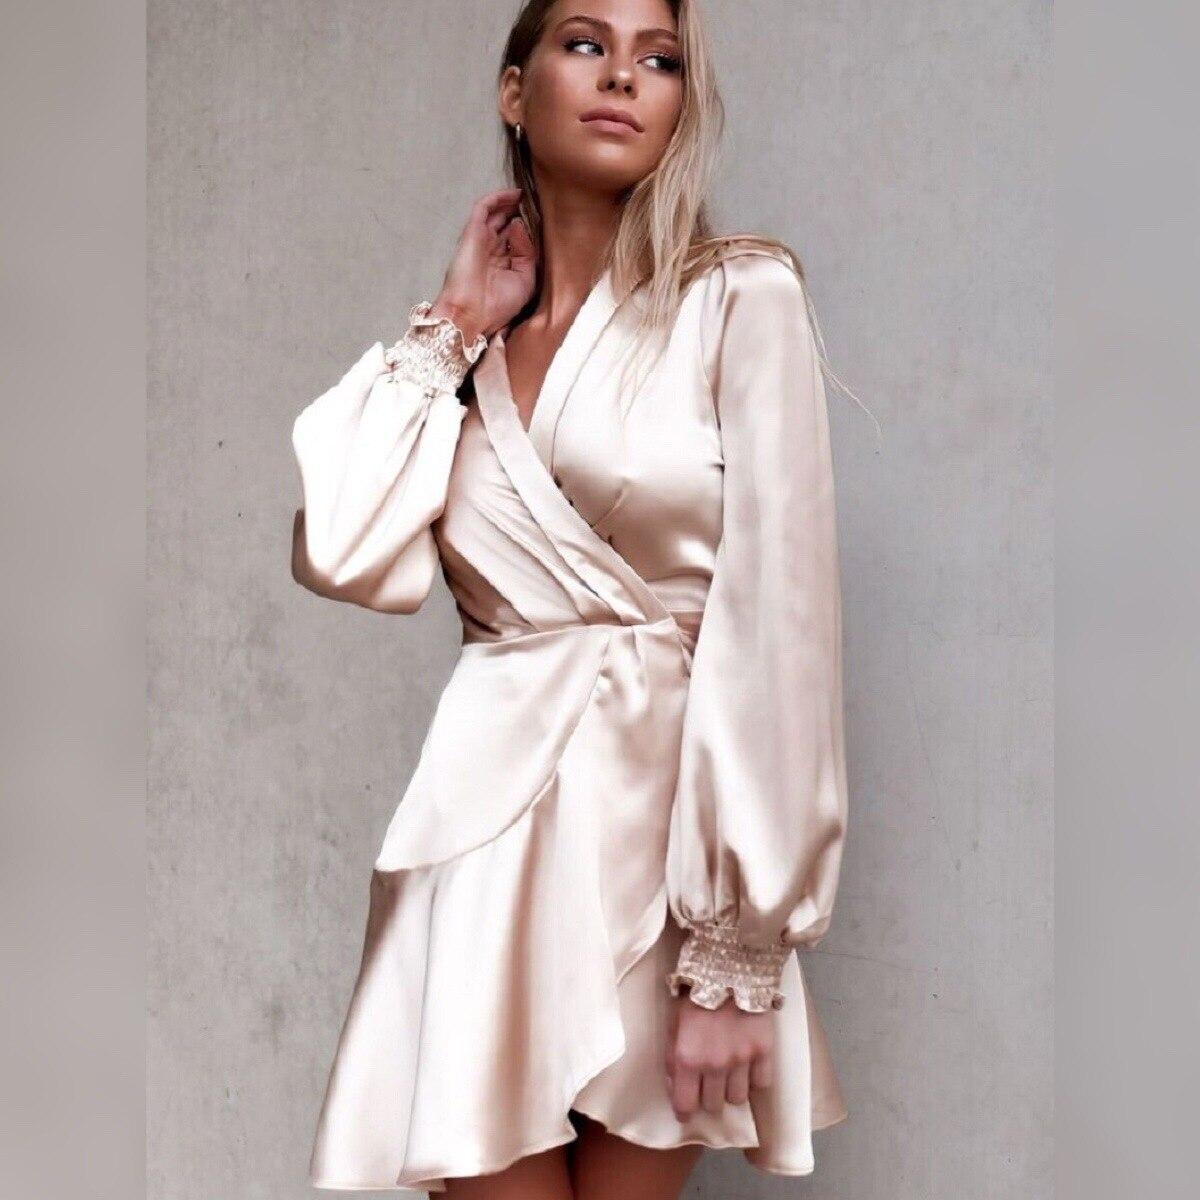 Women Elegant Satin Ruffles Mini Dress Long Sleeves V-neck Solid Pink Holiday Short Dresses New Party Robe Femme Vestidos